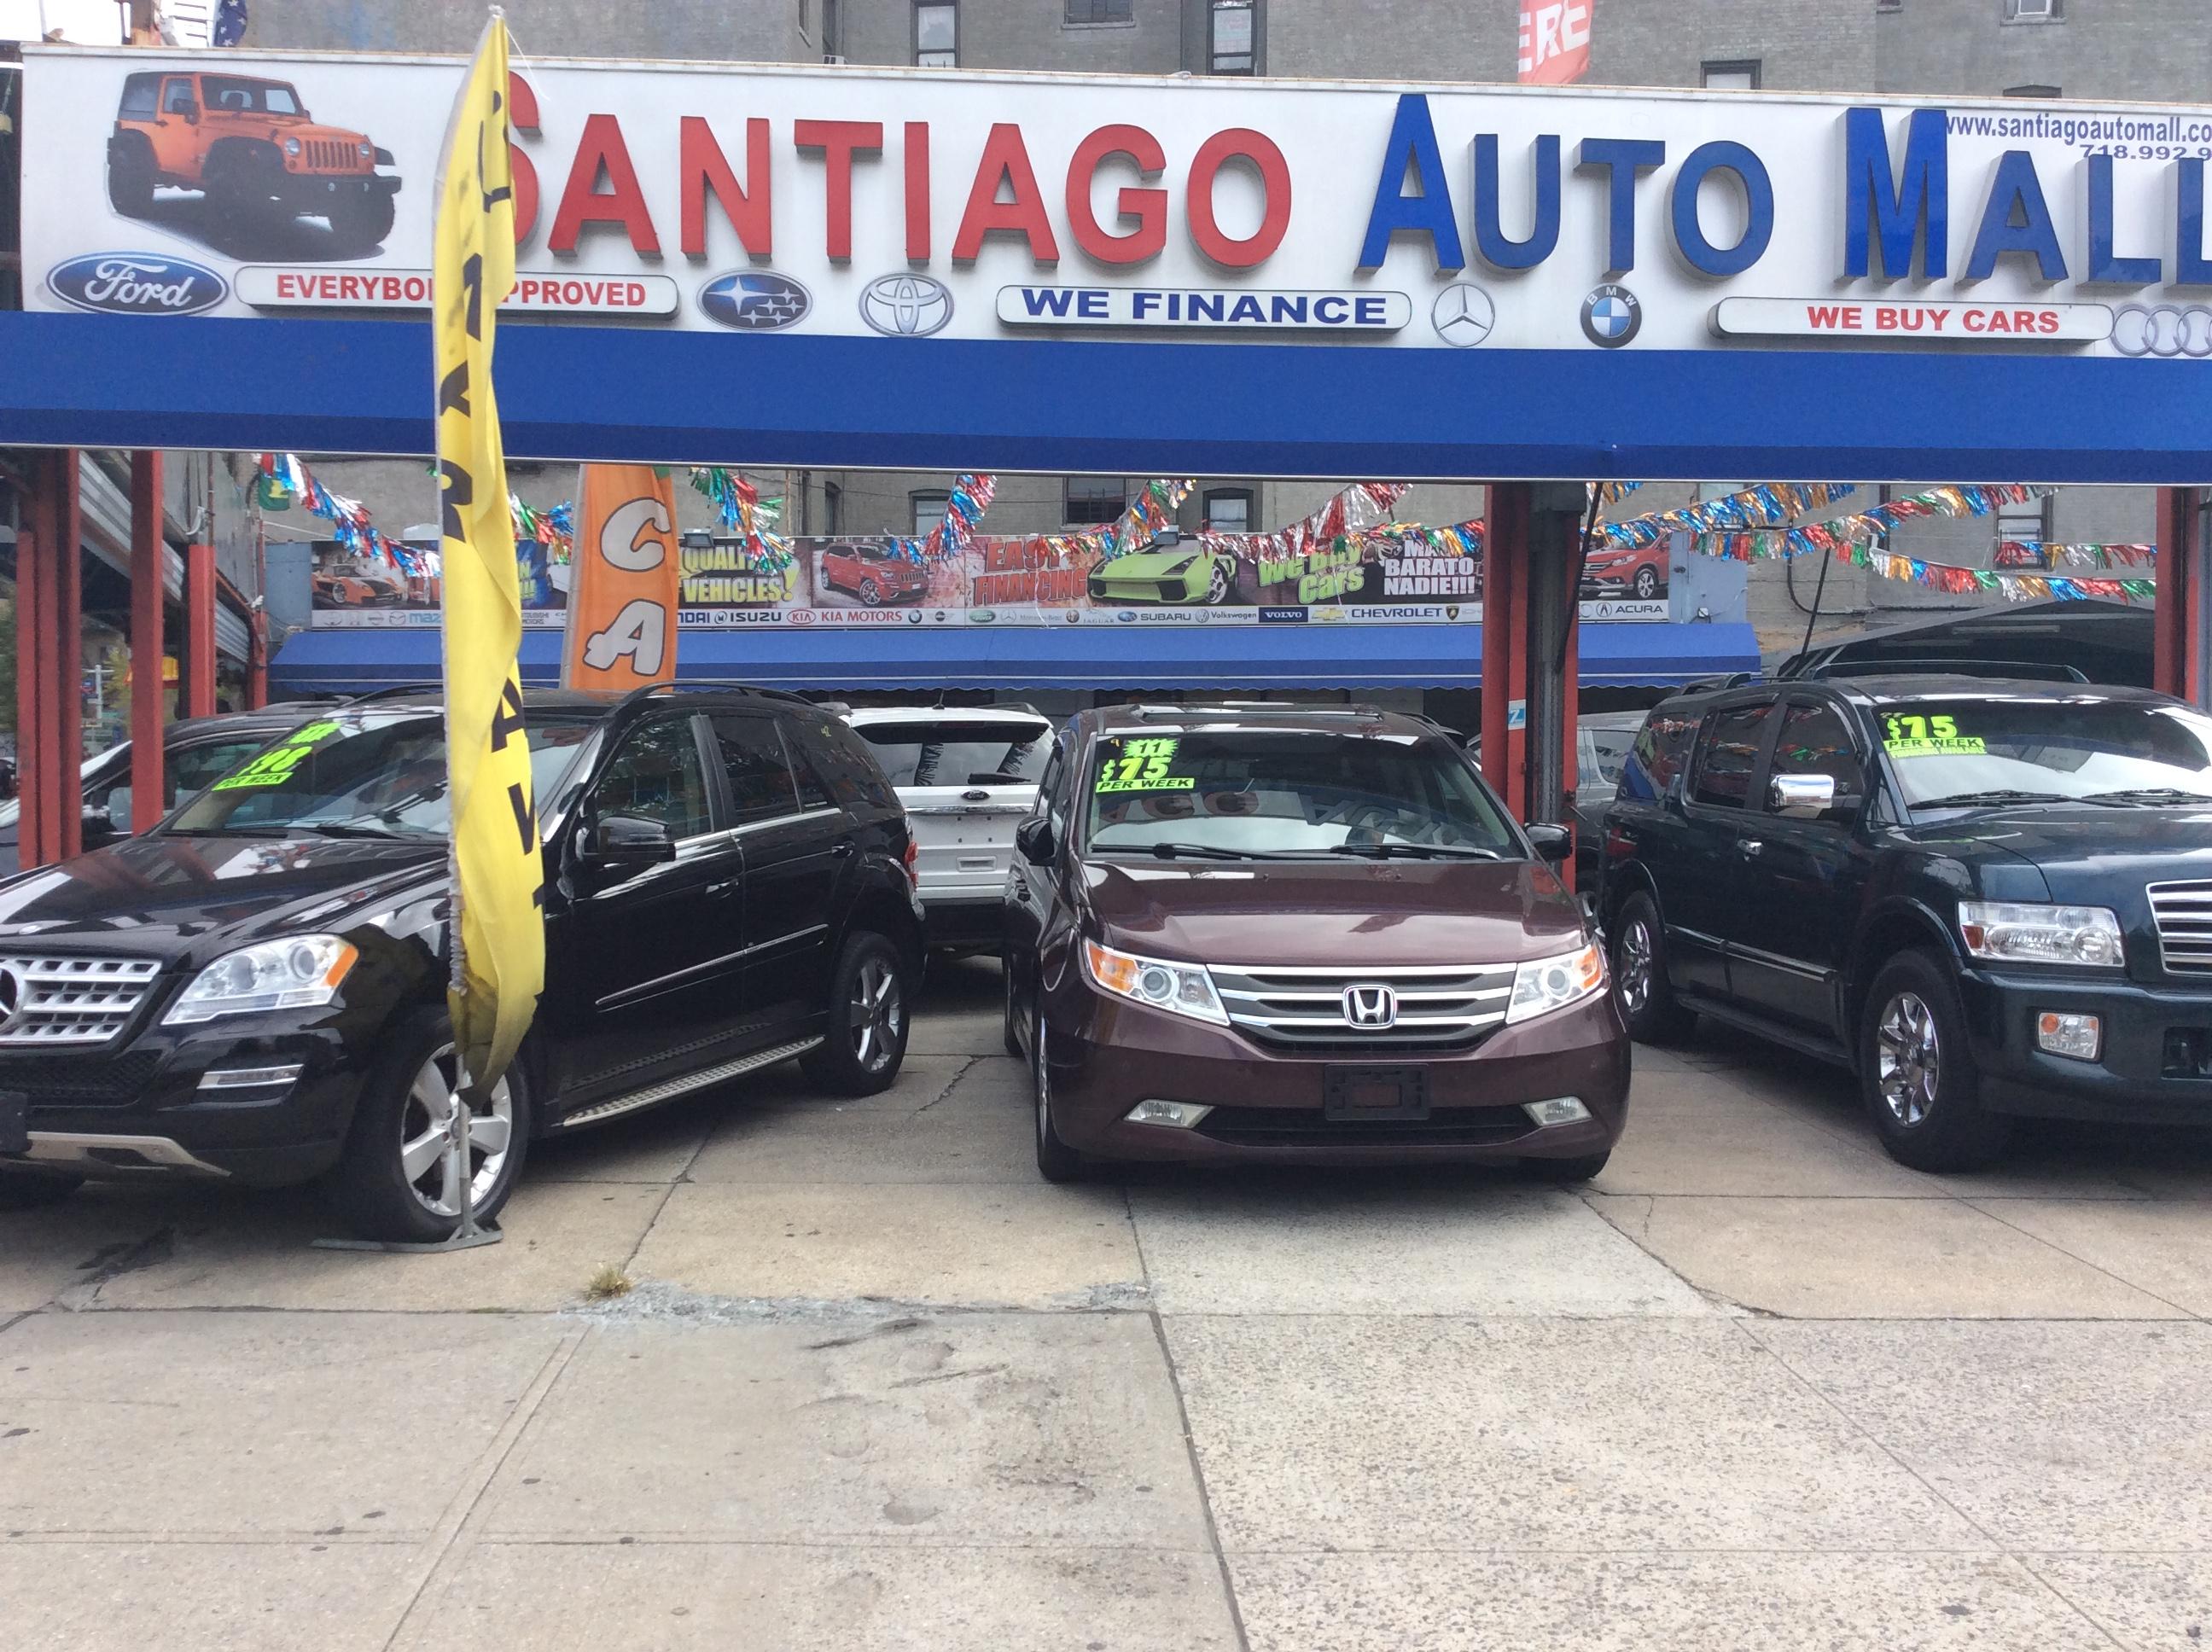 Santiago Auto Mall image 1